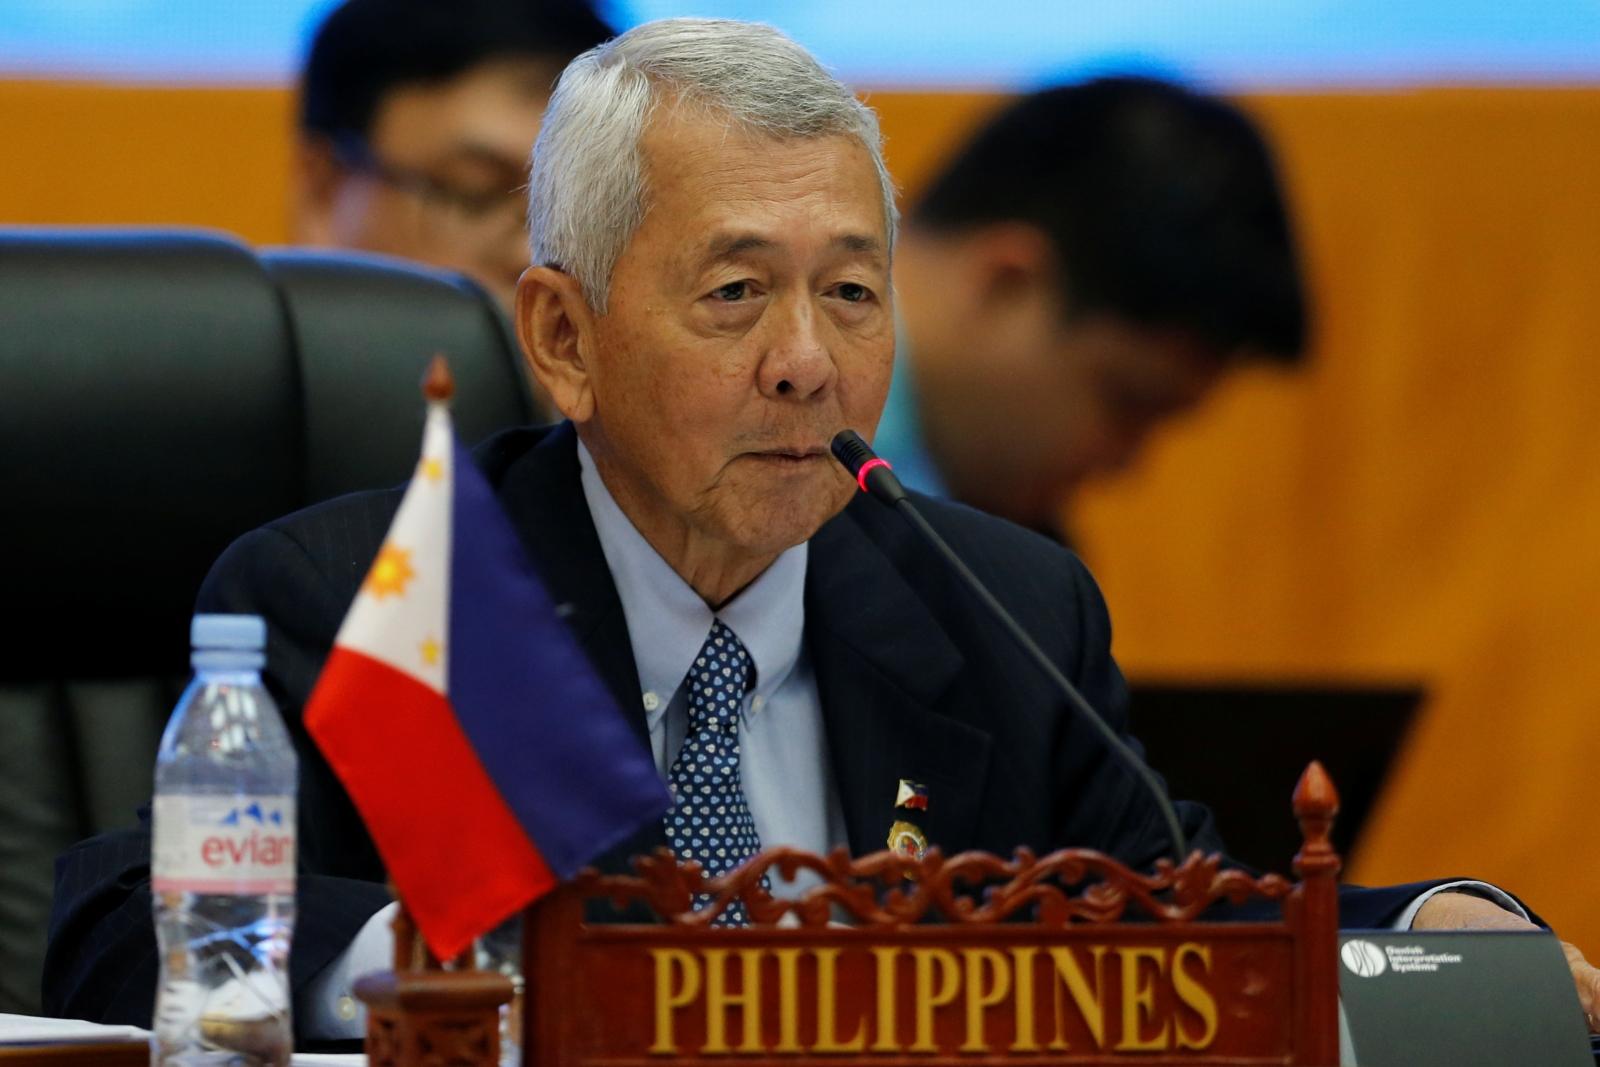 Philippine Foreign Secretary Perfecto Yasay